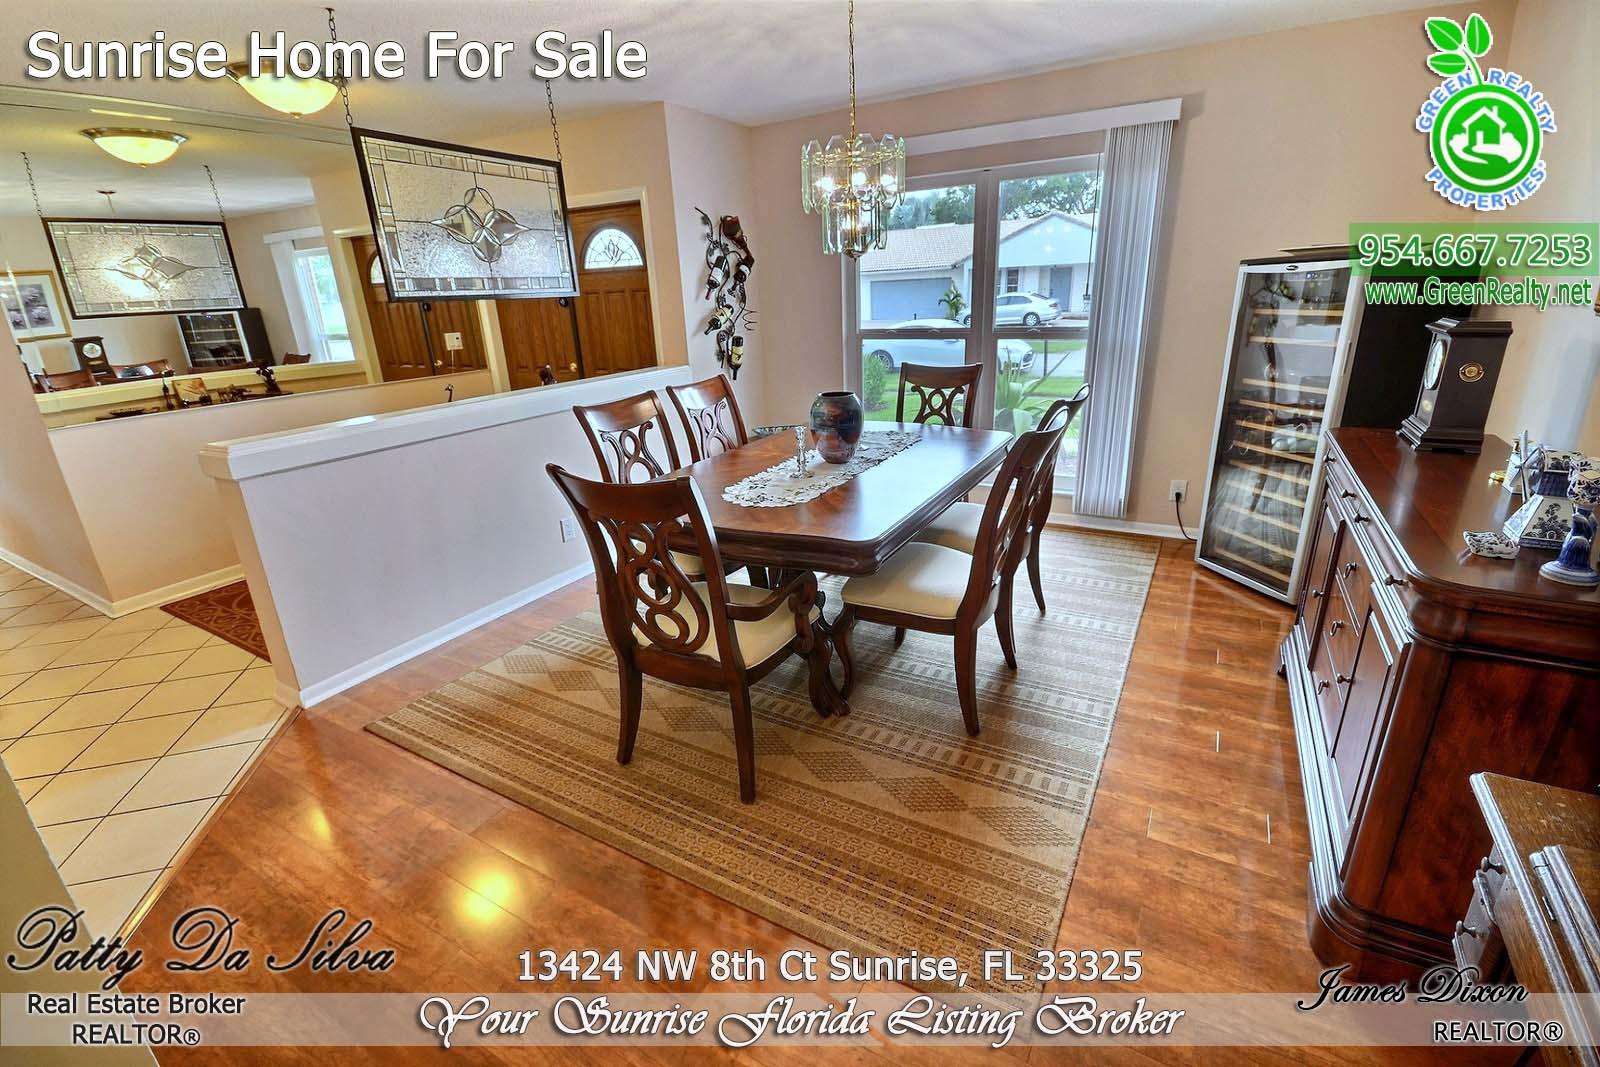 9 Sunrise Florida Homes For Sale (4)